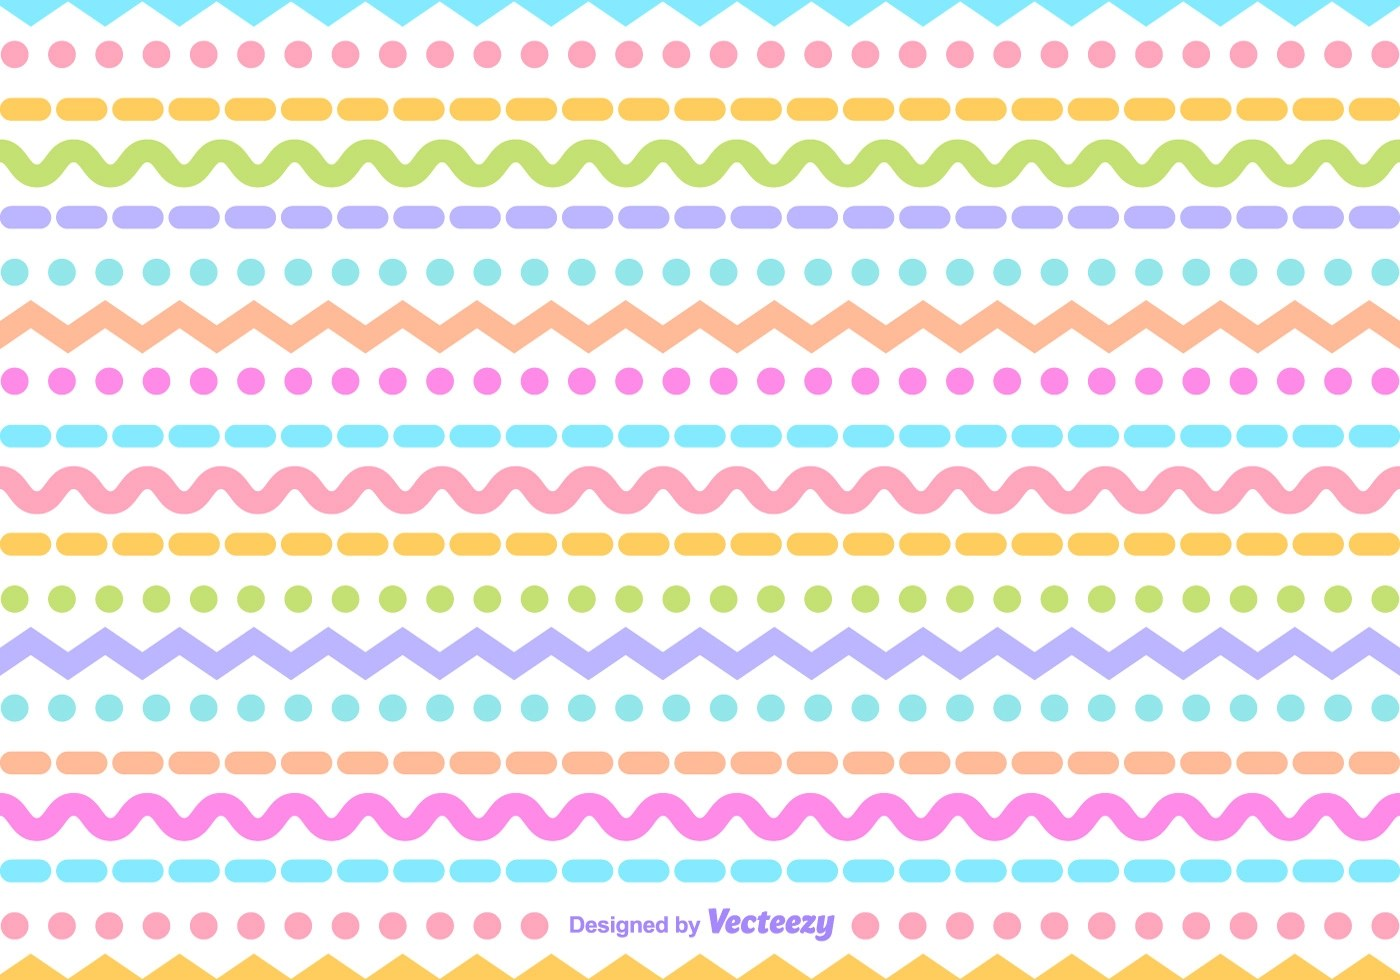 Black And White Polka Dot Wallpaper Border Zig Zag Vector Pattern Download Free Vector Art Stock